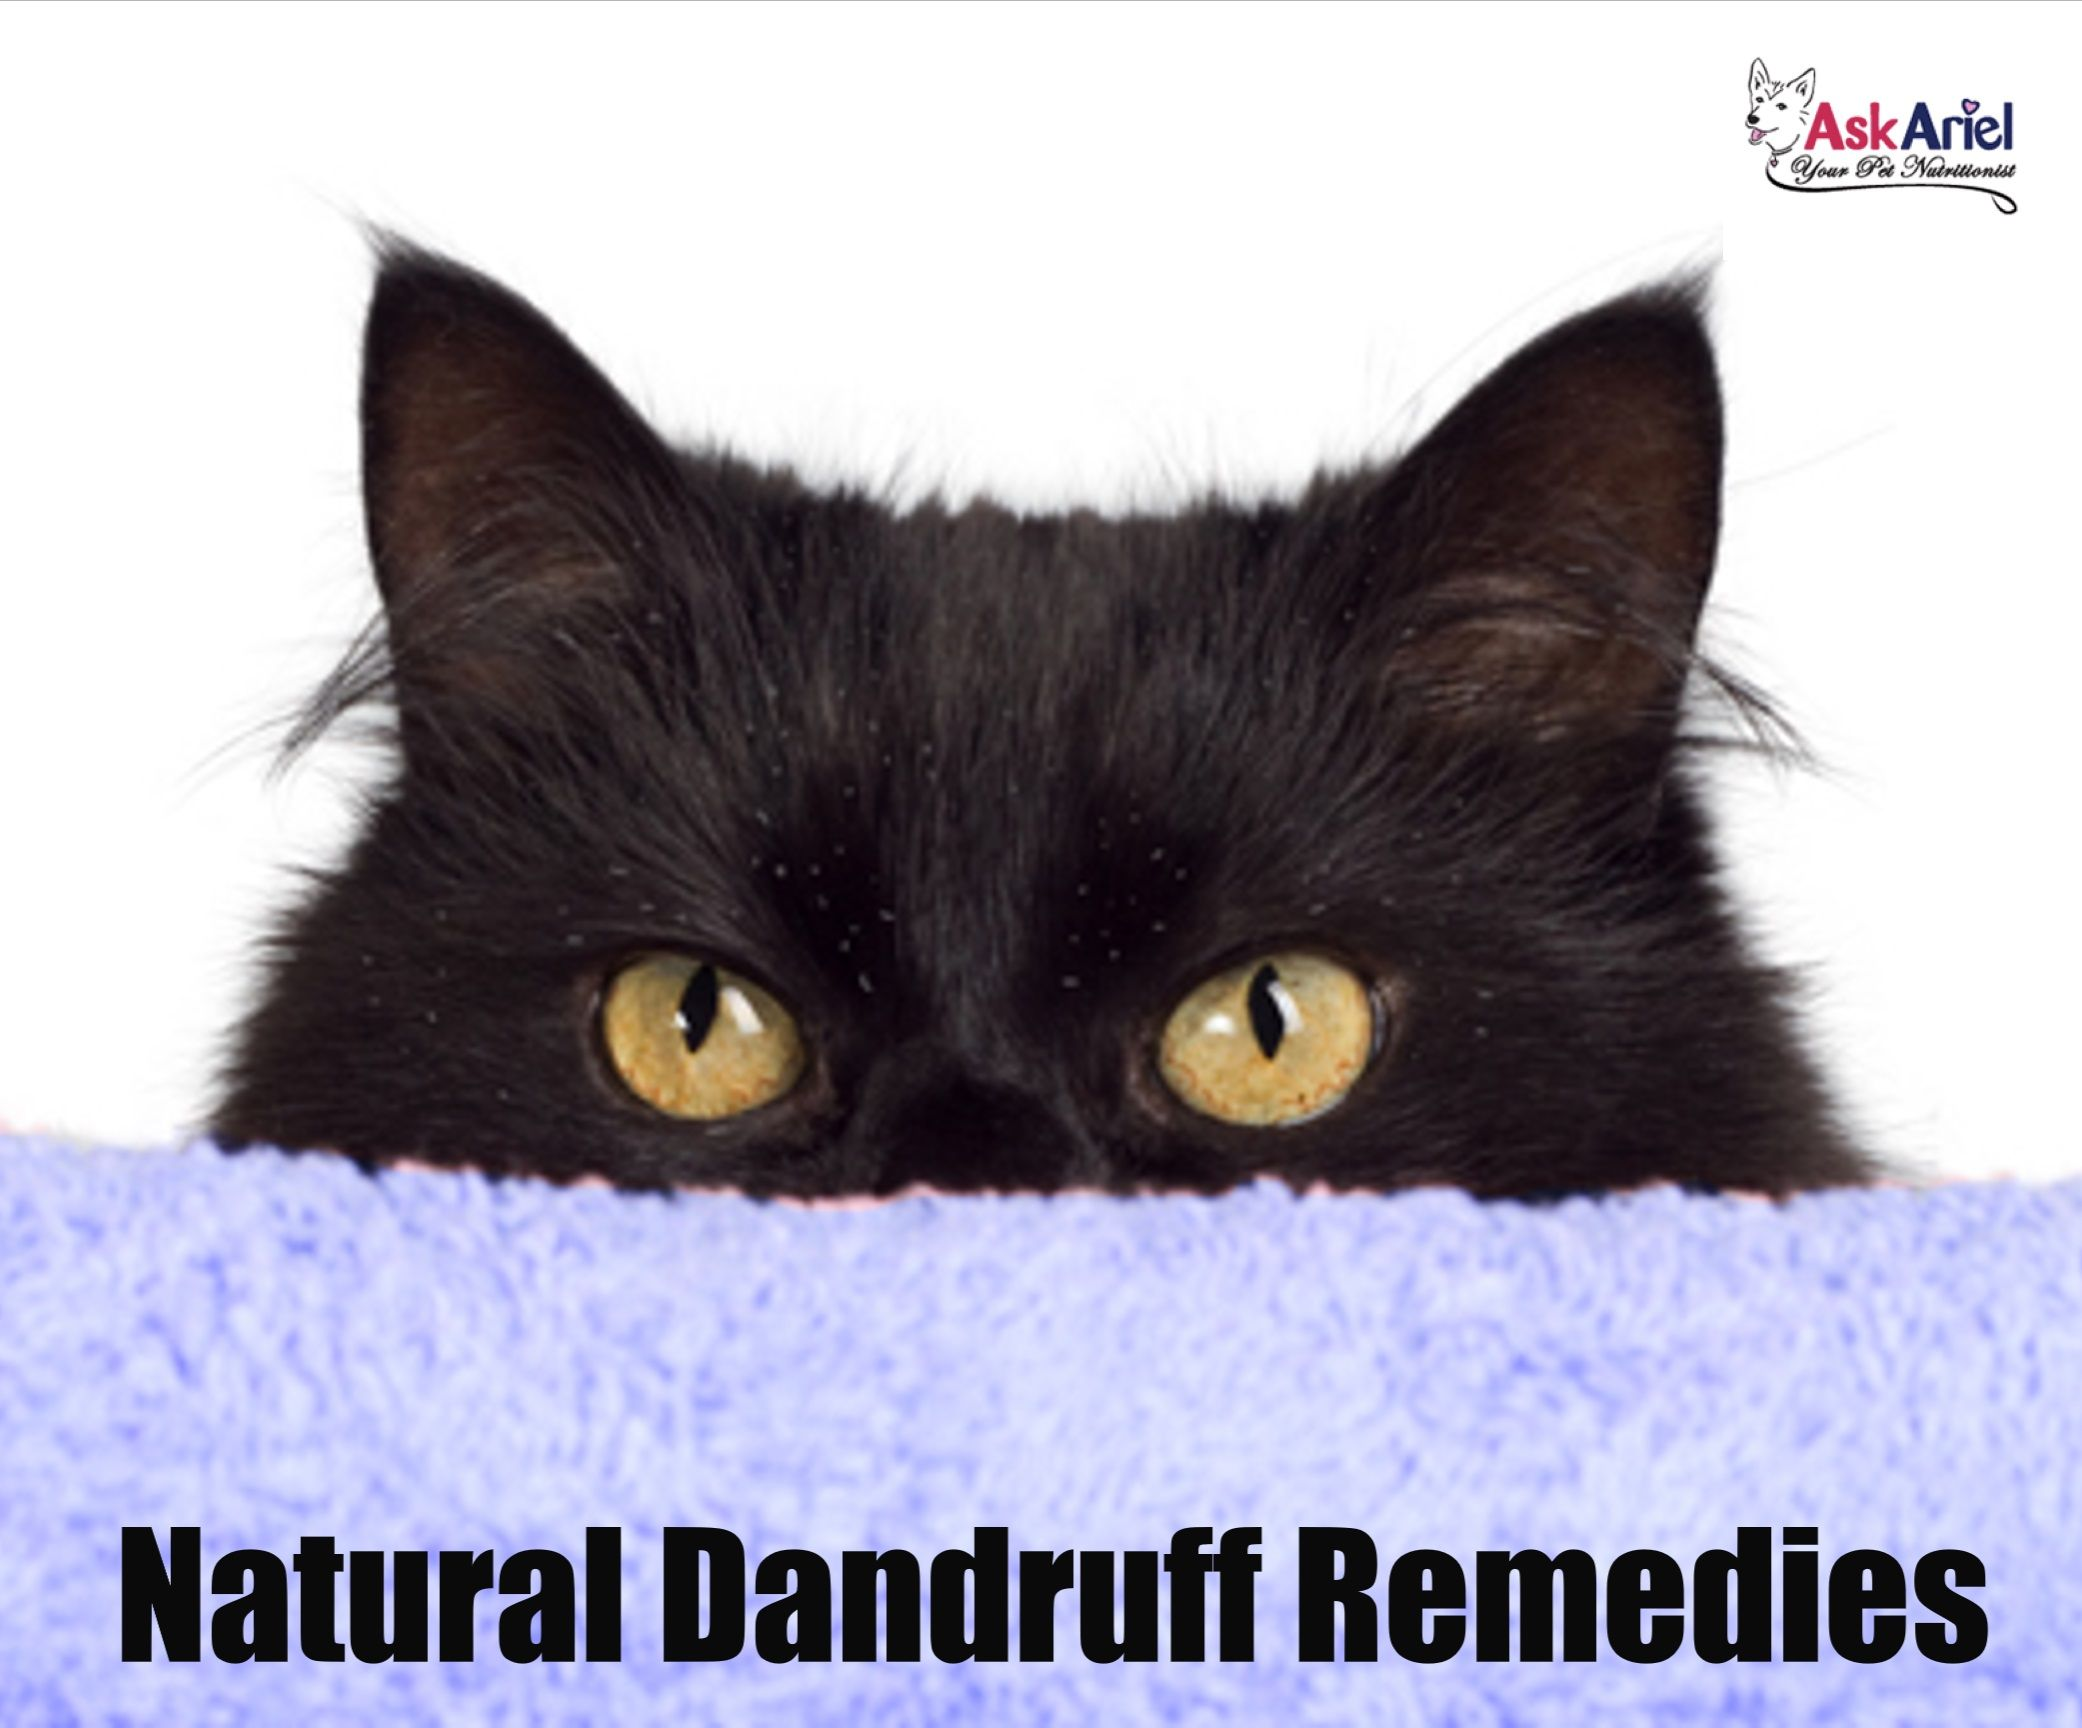 Natural Remedies For Cat Dandruff In 2020 Cat Dandruff Dandruff Causes Cats